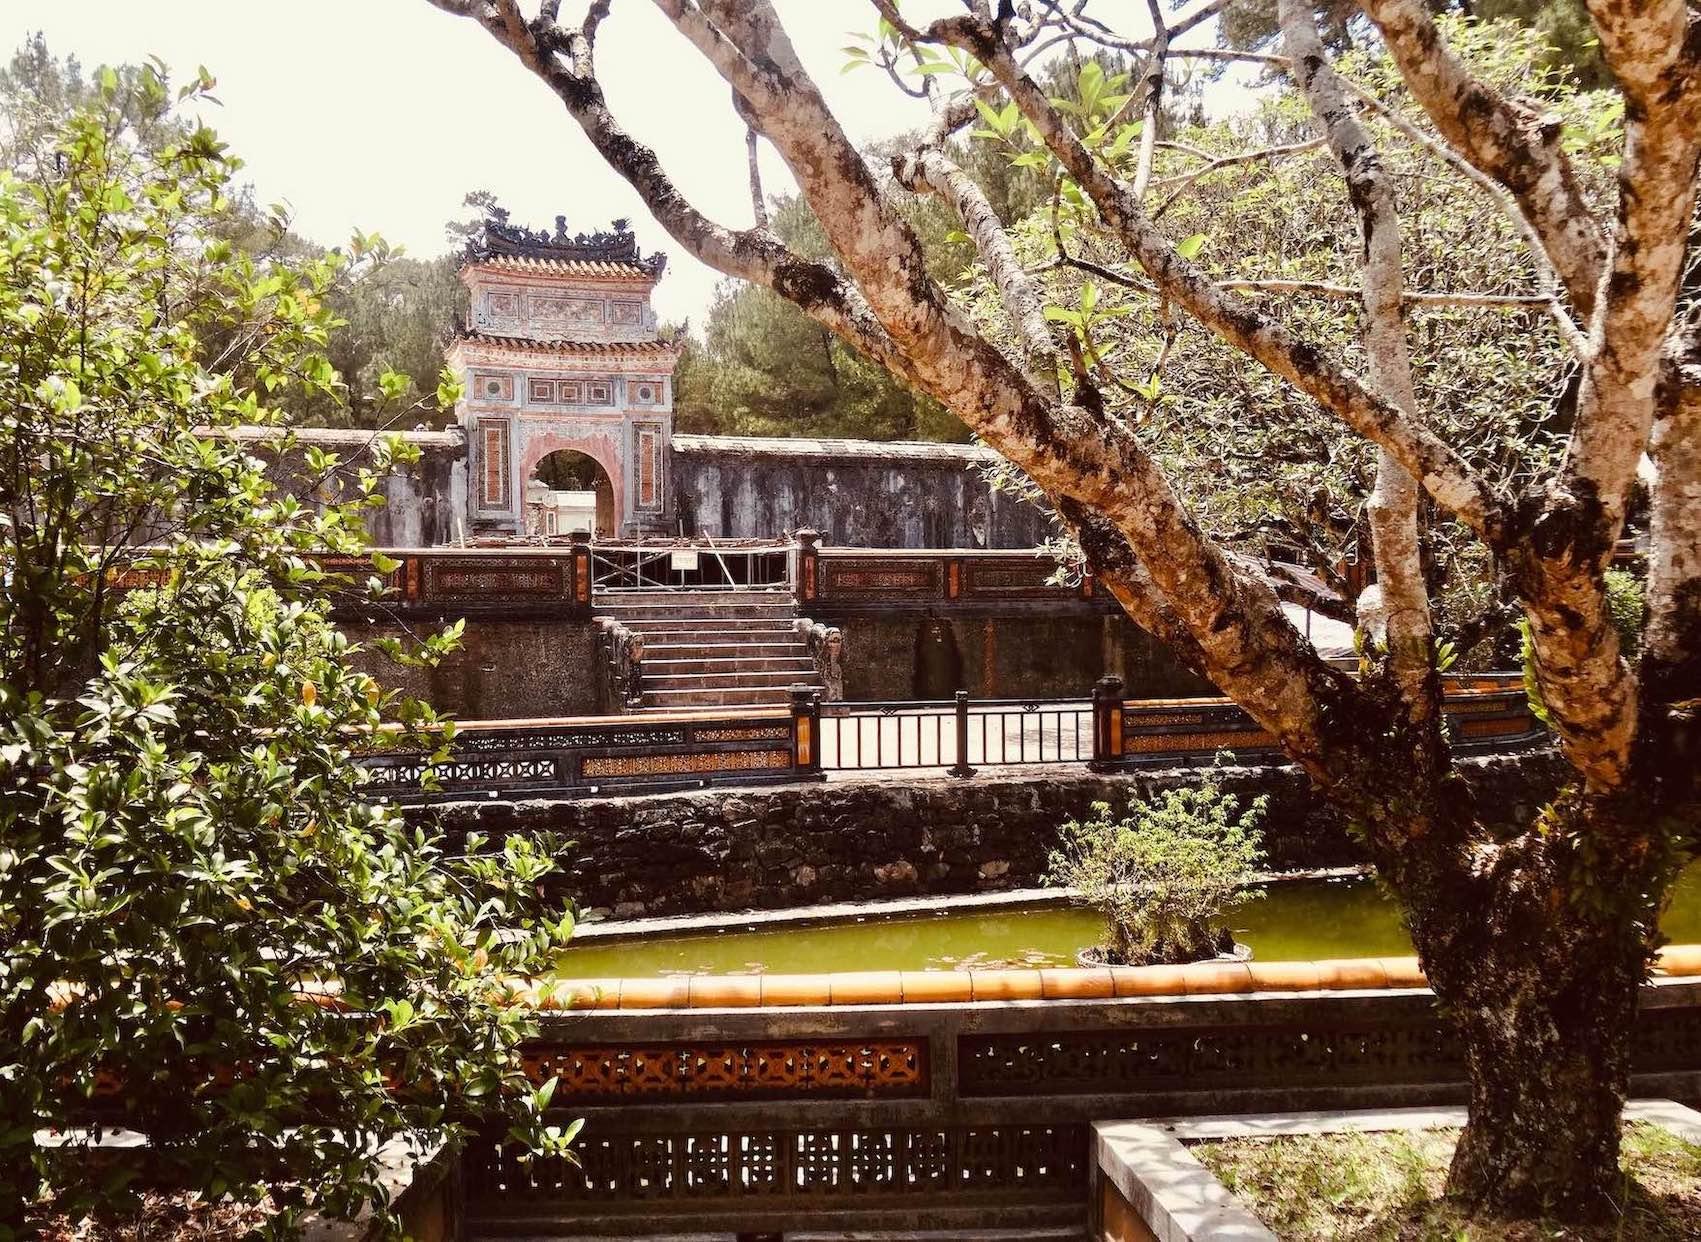 Burial area Tomb of Emperor Tu Duc